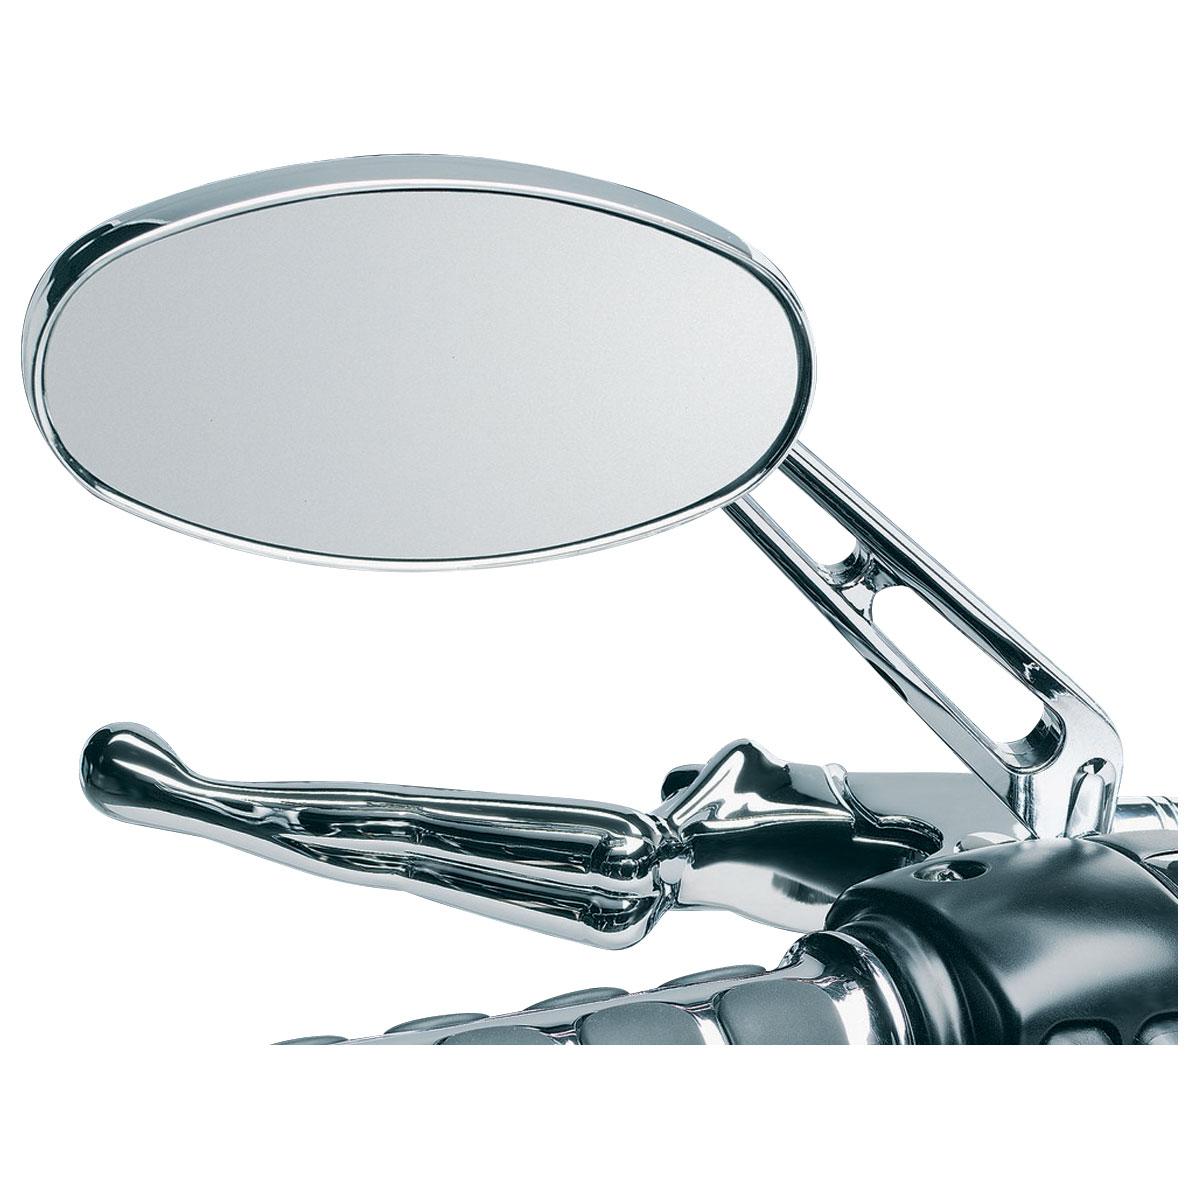 Kuryakyn Ellipse Mirrors with Flat Glass